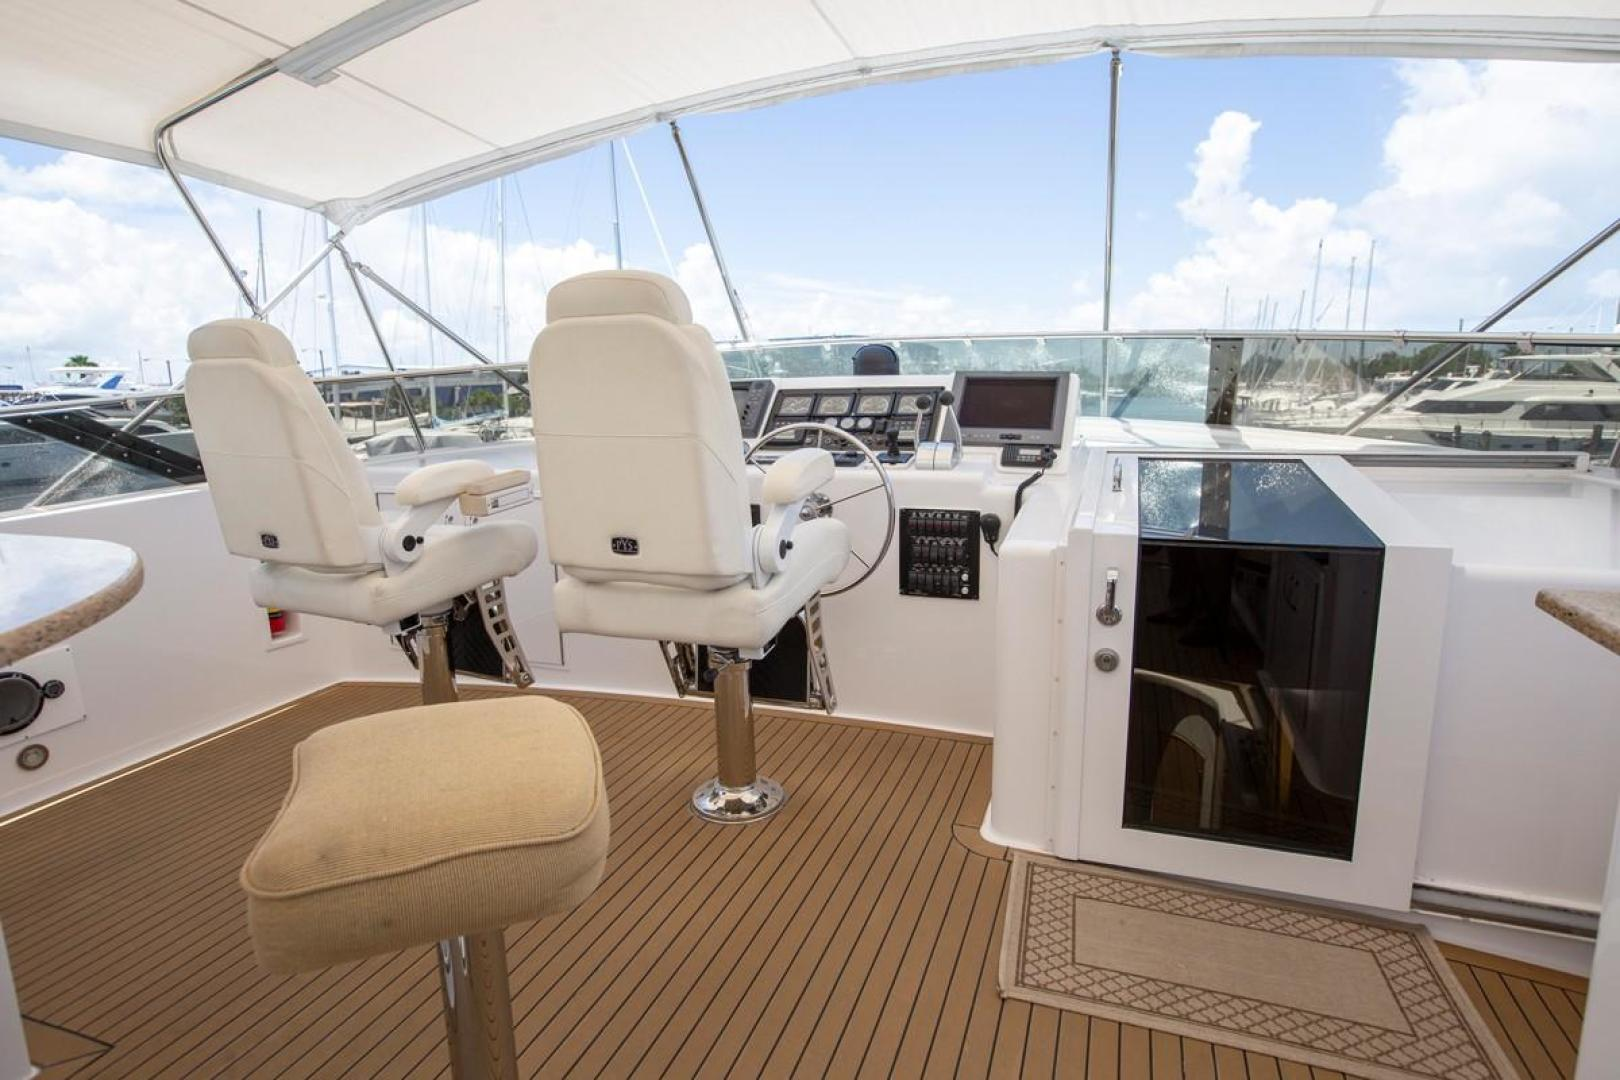 Hatteras-Cockpit Motor Yacht 2000-Getaway Ft. Lauderdale-Florida-United States-977395 | Thumbnail